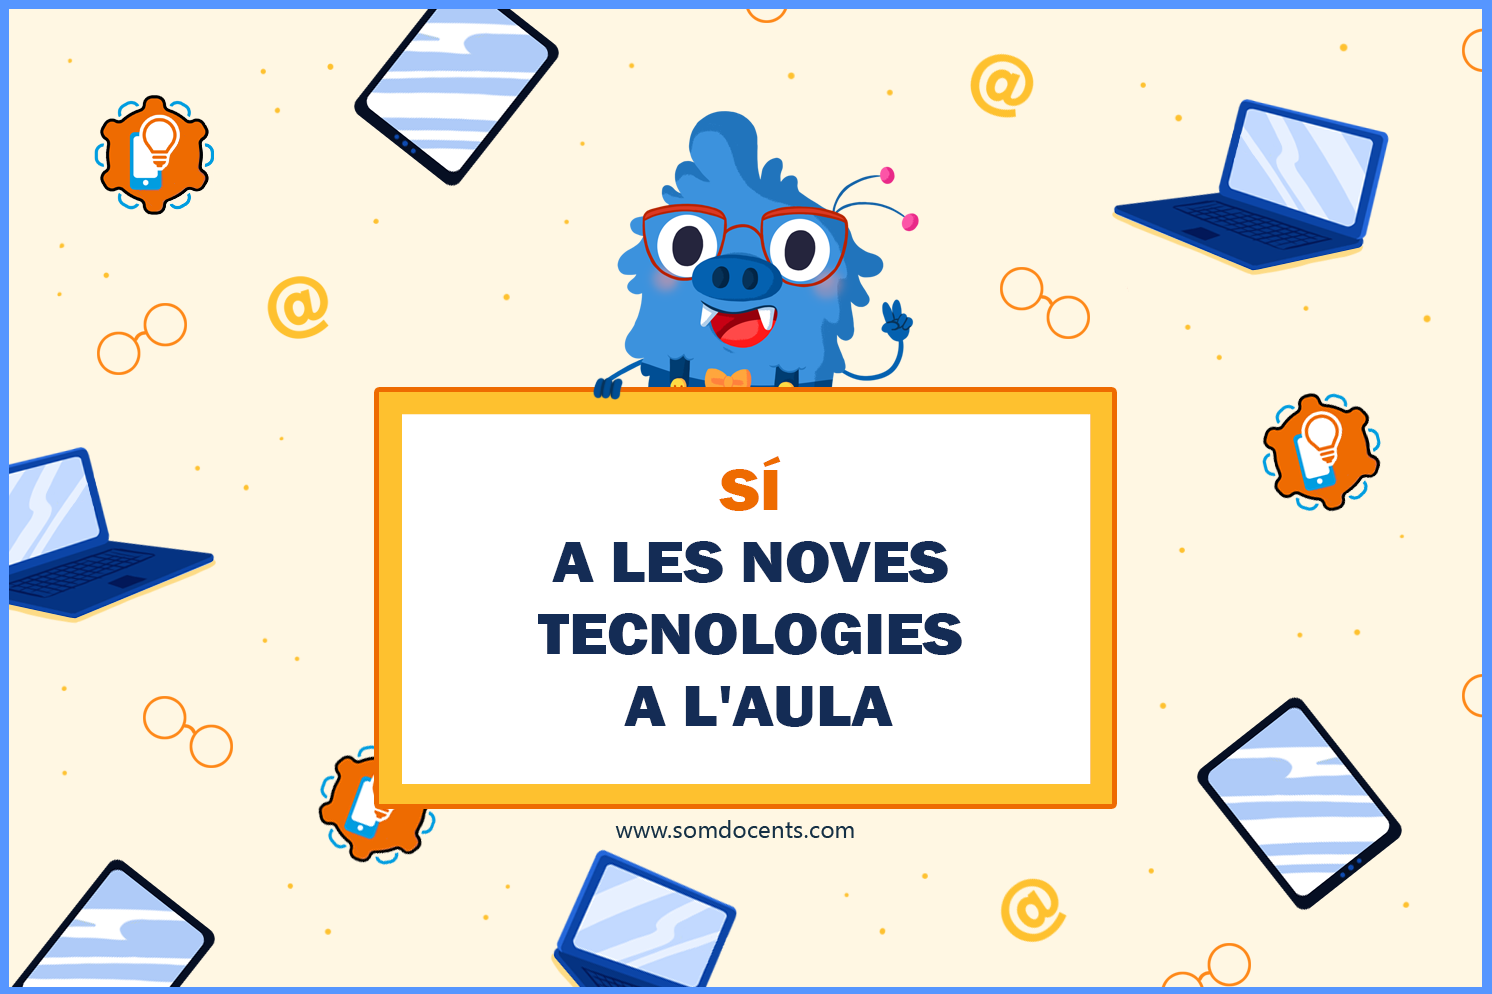 somdocents-si-a-les-noves-tecnologies-a-l'aula